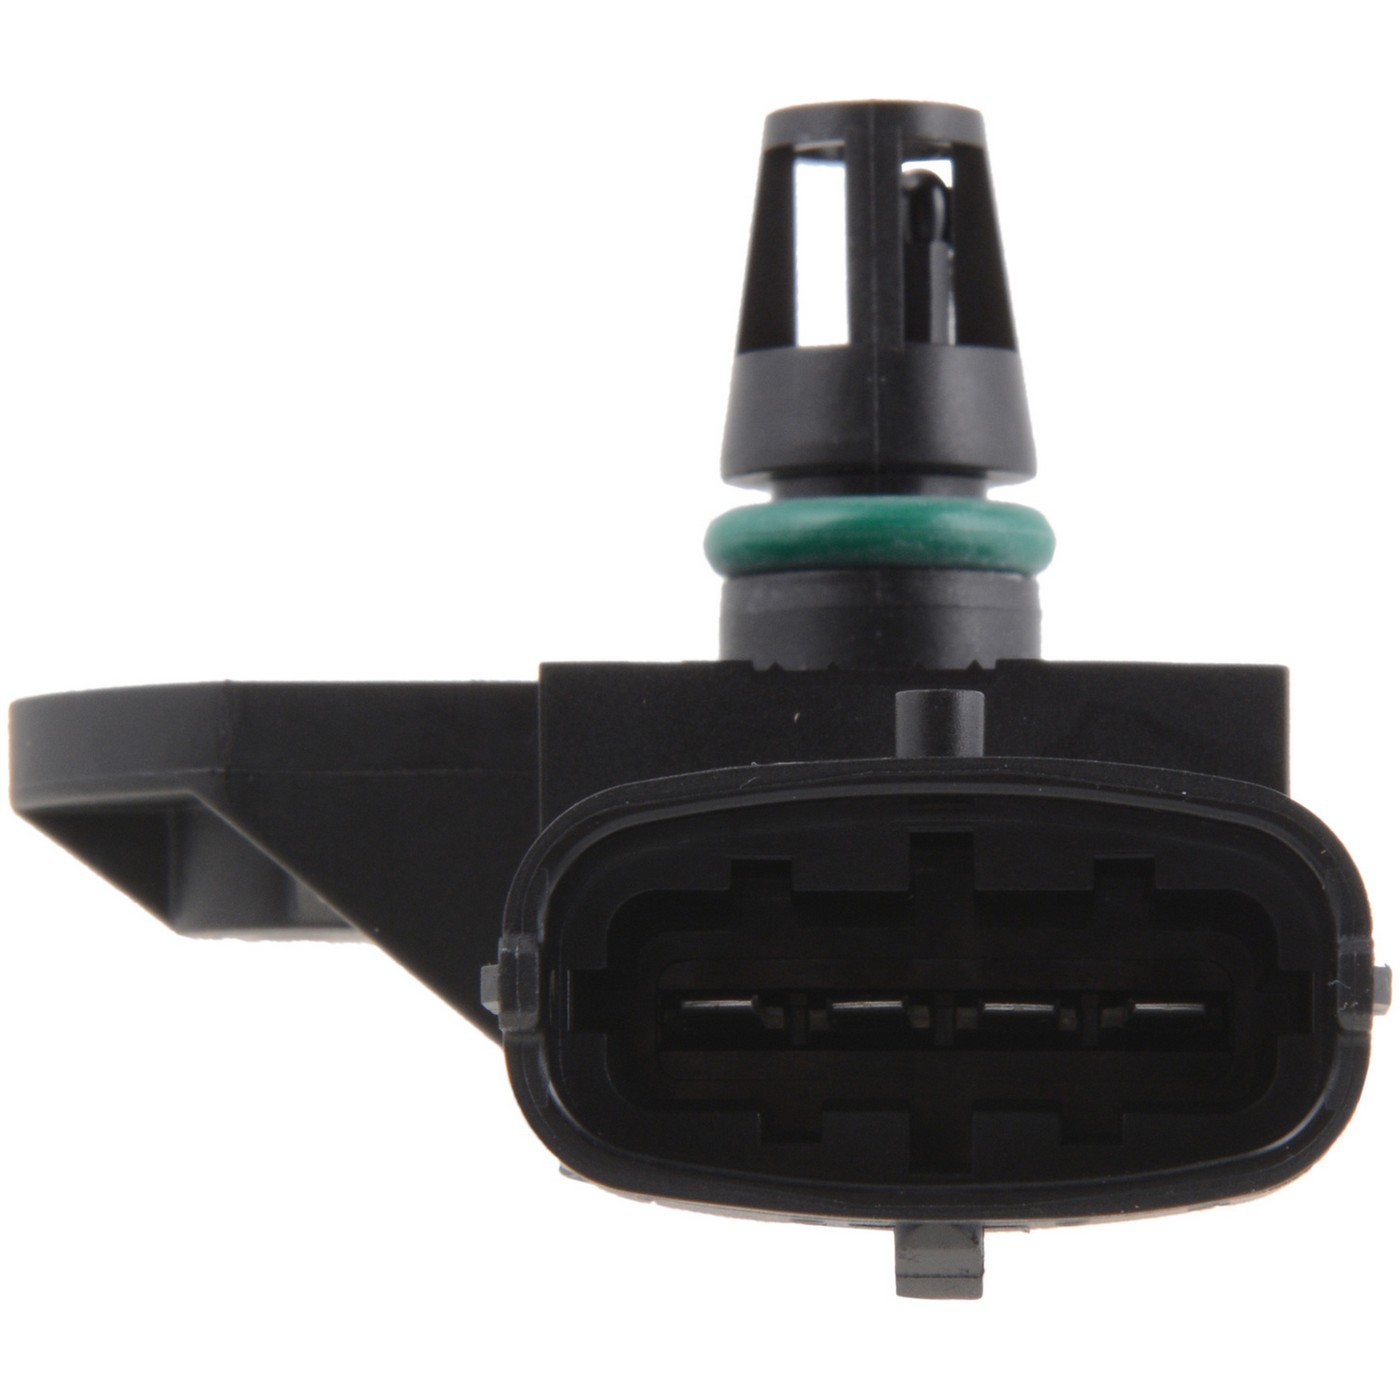 New Manifold Absolute Pressure Sensor Standard Product 0261230217 Fits Honda 11 1.2 1.4 02-14 Astra 98-11 Vectra 05-12 Zafira 2.0 2.4 0261230217